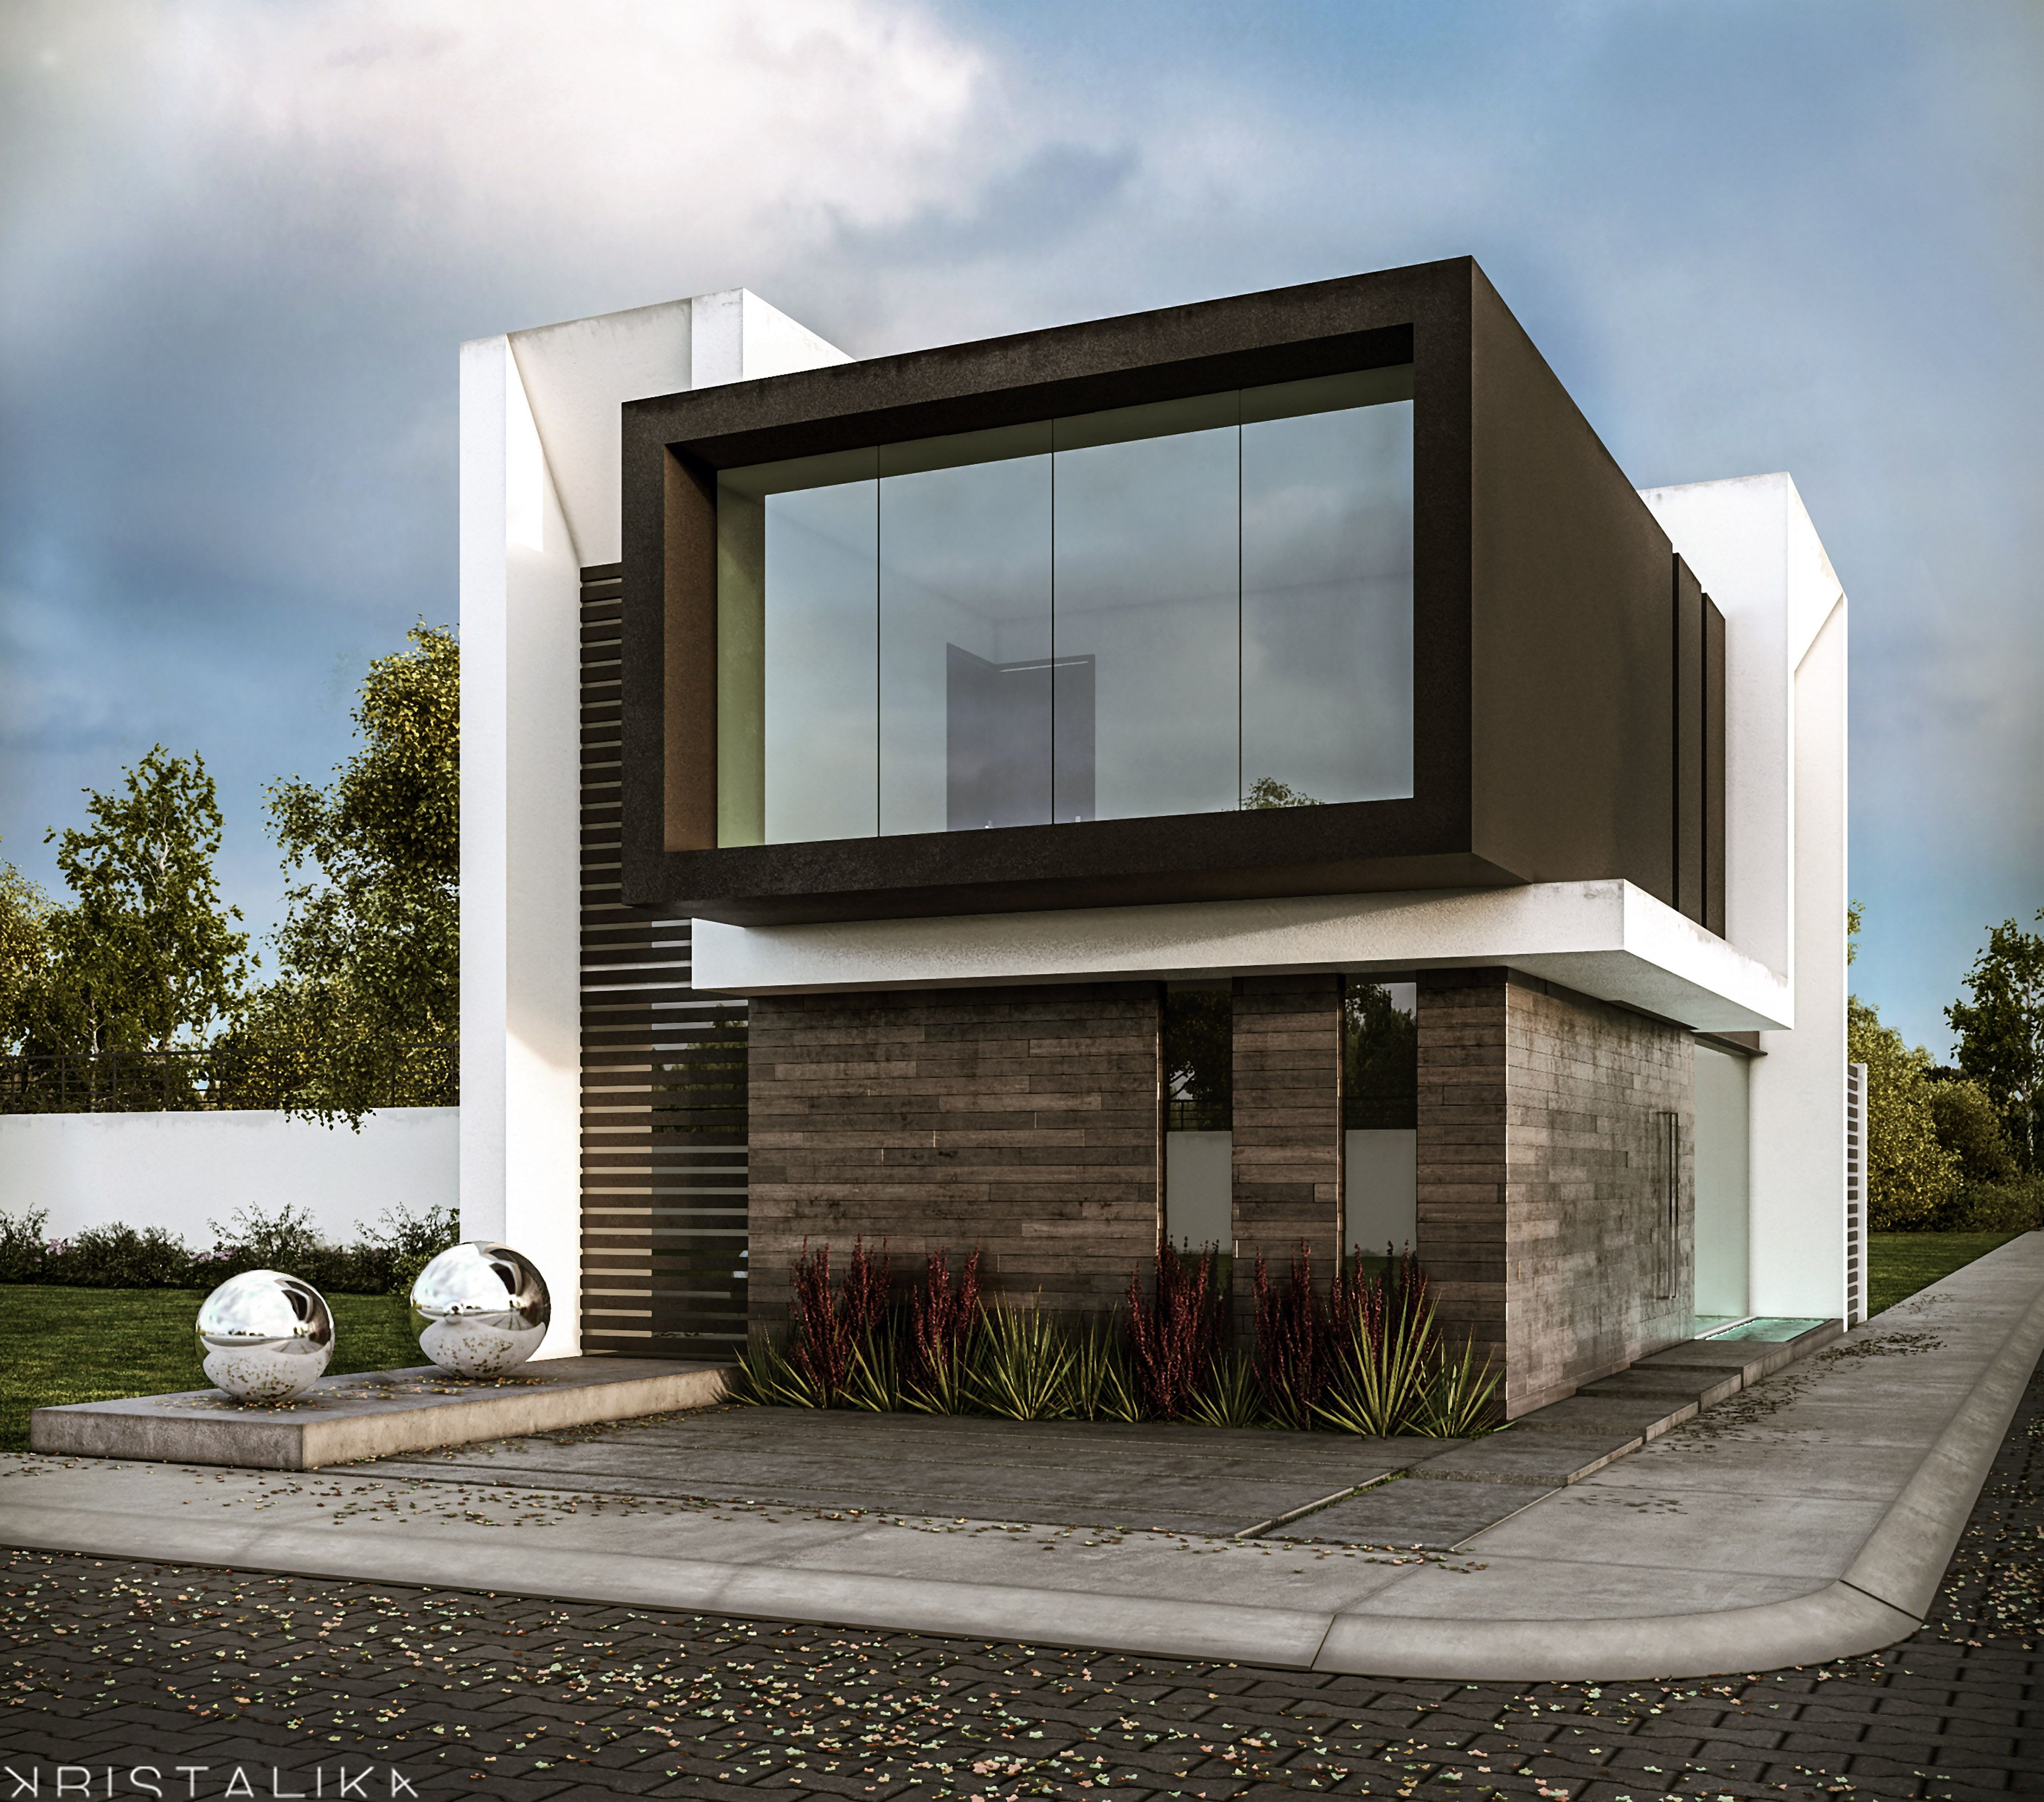 Sensacional cuadrada y minimalista pinterest fachadas for Viviendas minimalistas